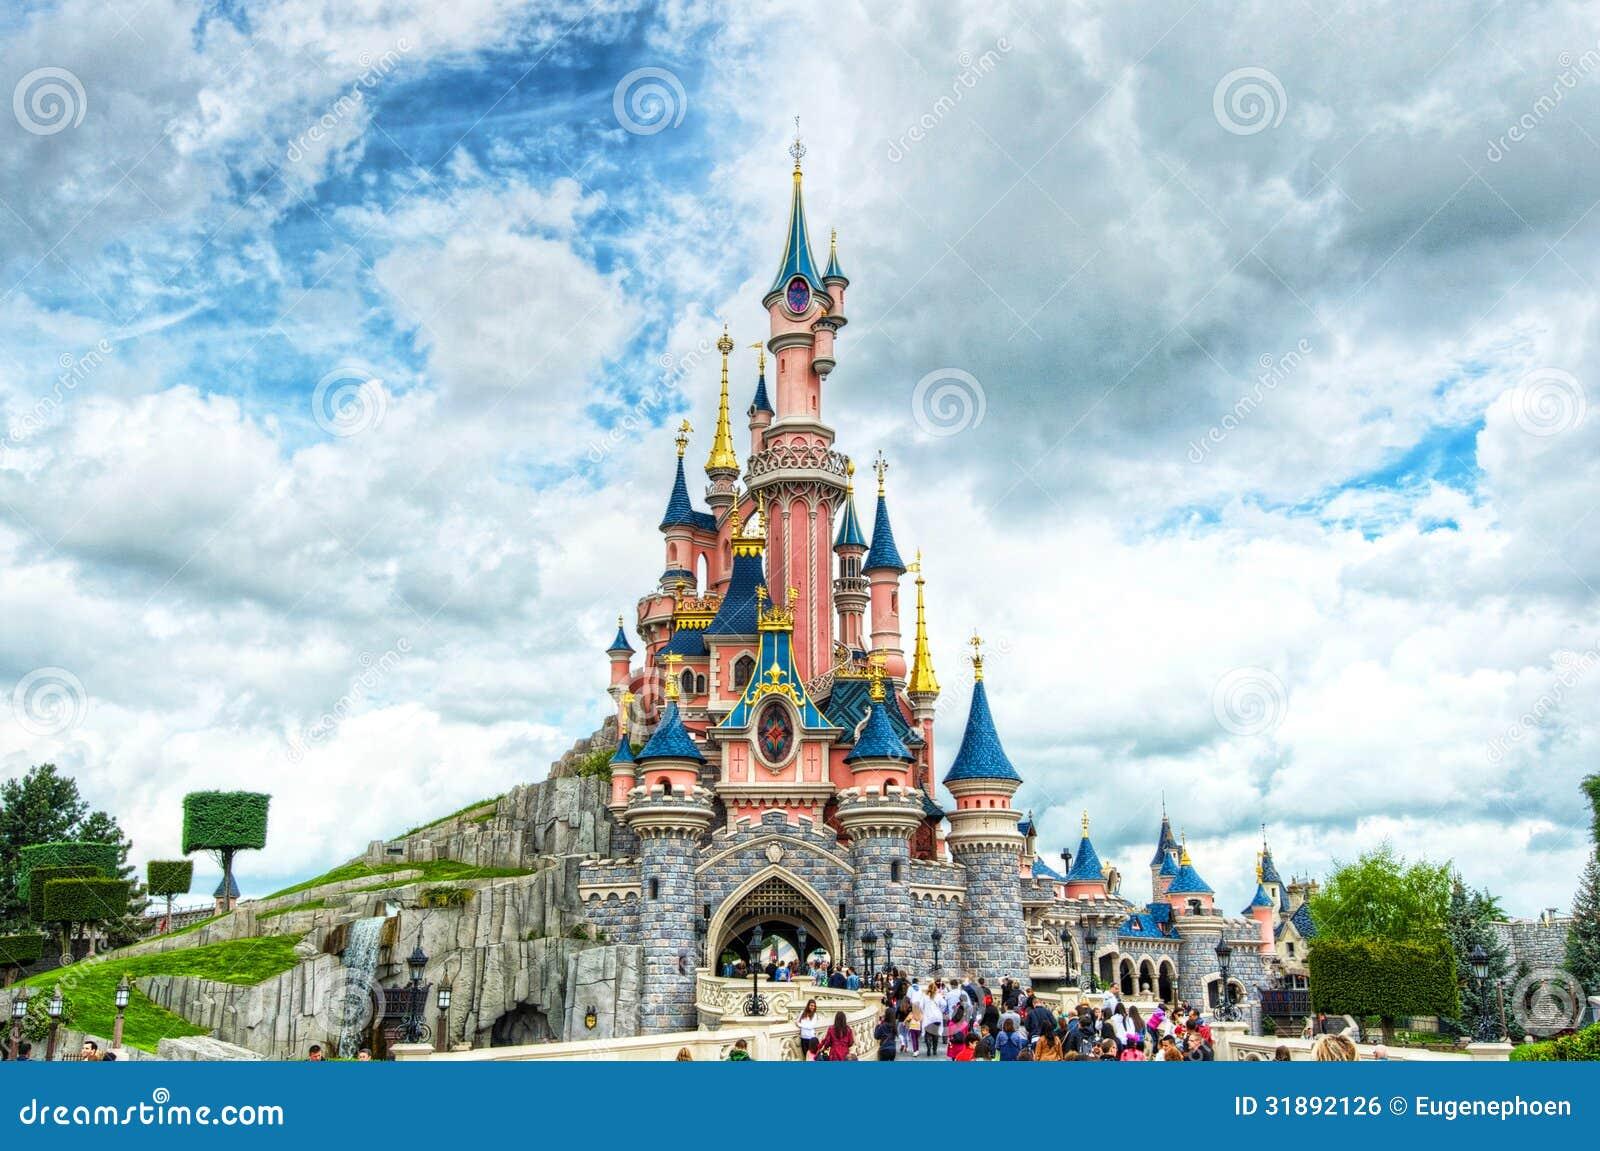 Märchen-Schloss in Frankreich